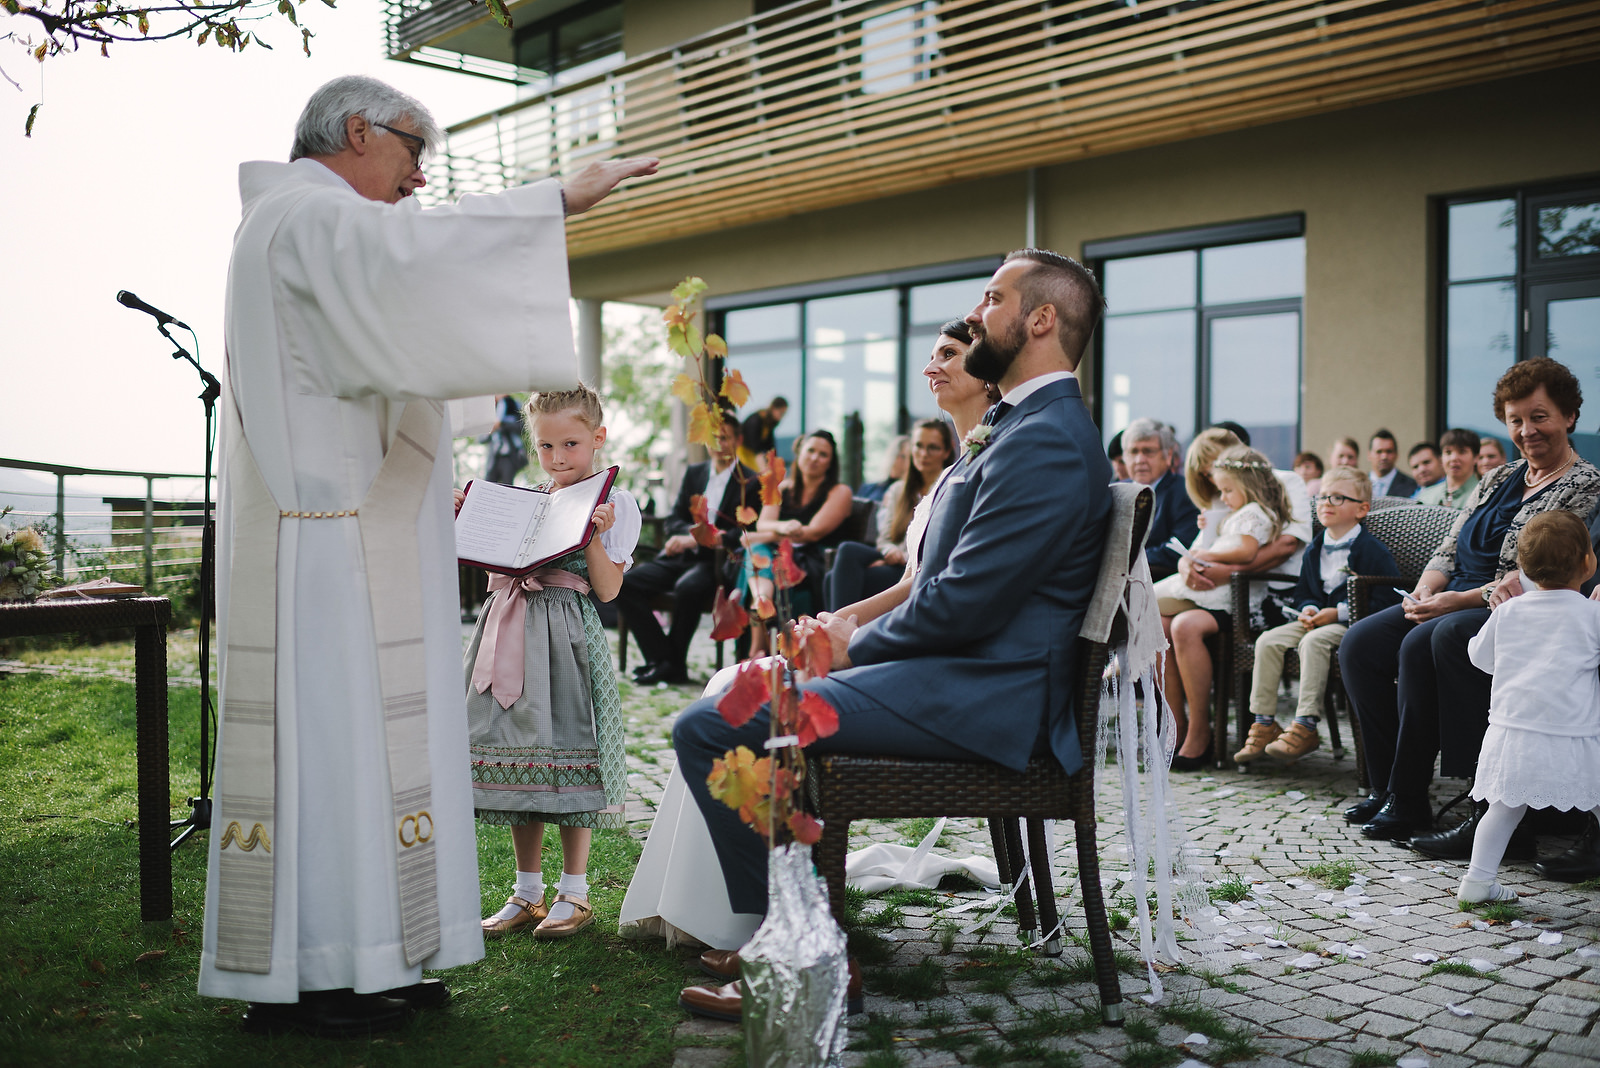 Fotograf Konstanz - Hochzeitsfotograf Reutlingen Achalm Hochzeit EFP 57 - Als Hochzeitsfotograf auf der Achalm, Reutlingen  - 47 -